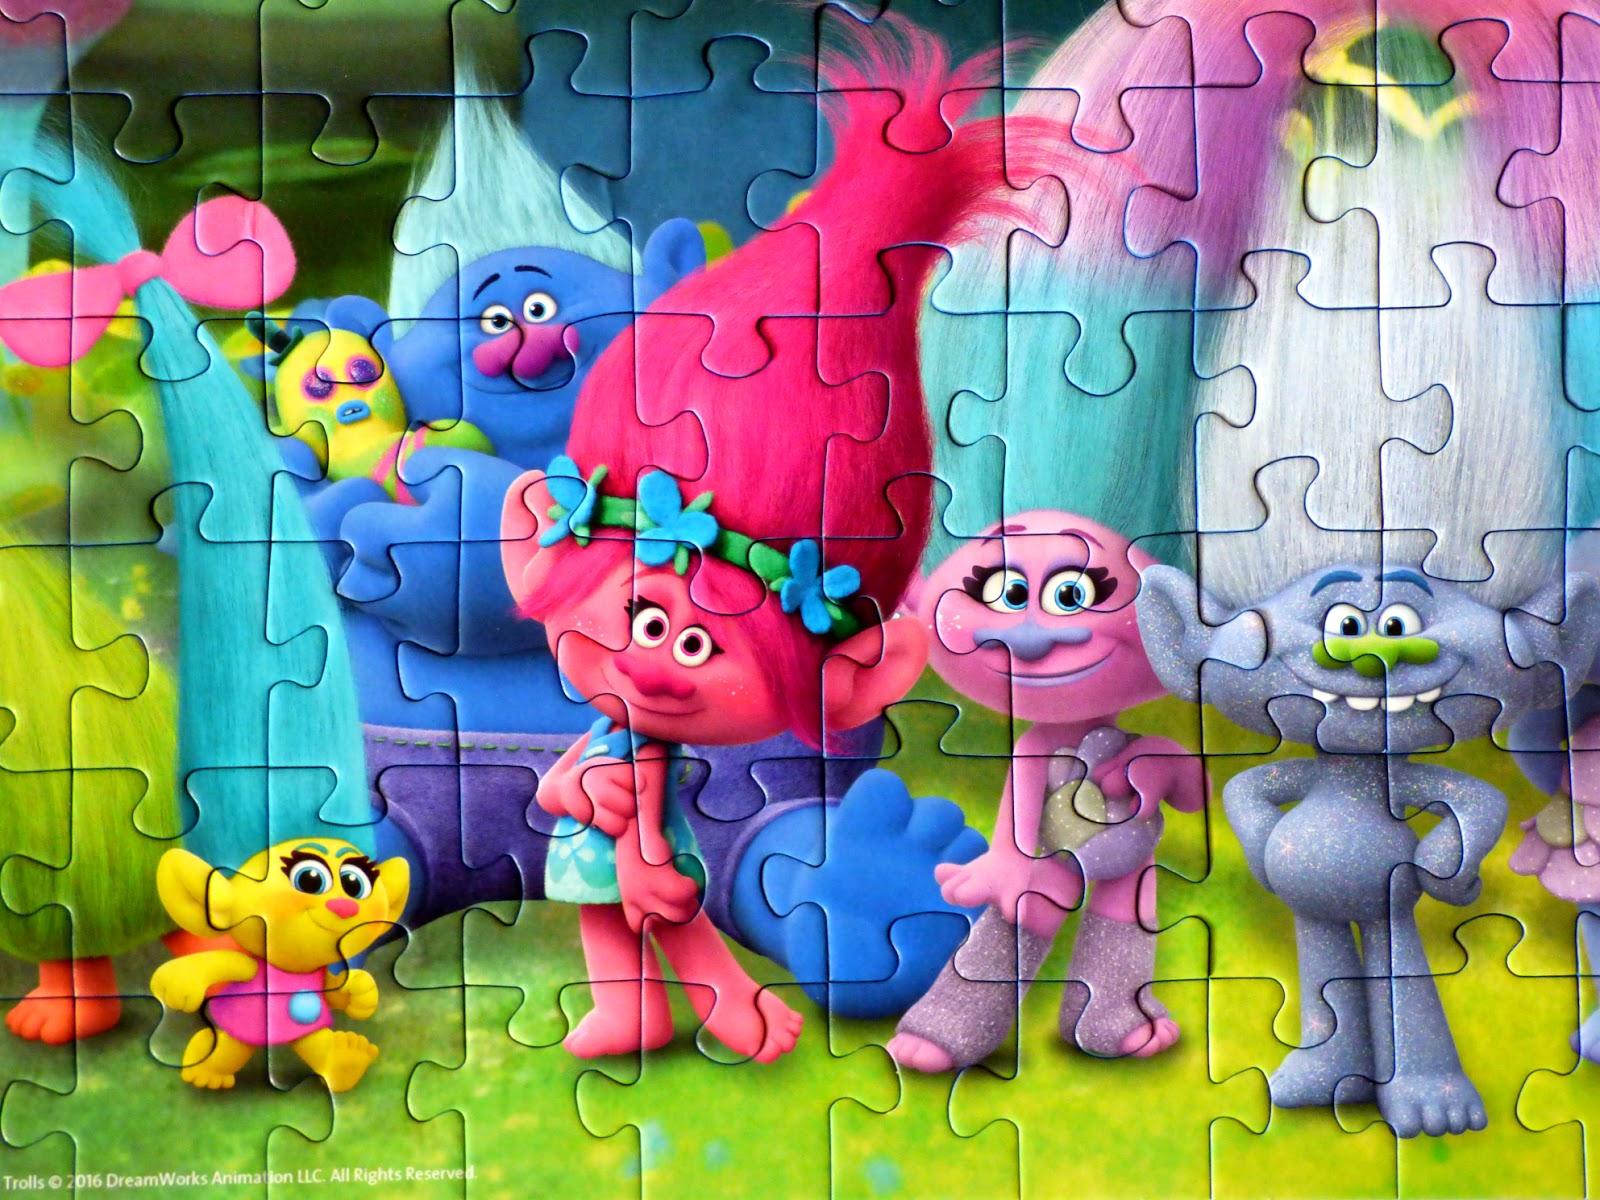 Chez Maximka: Trolls 100pc jigsaw puzzle from Ravensburger